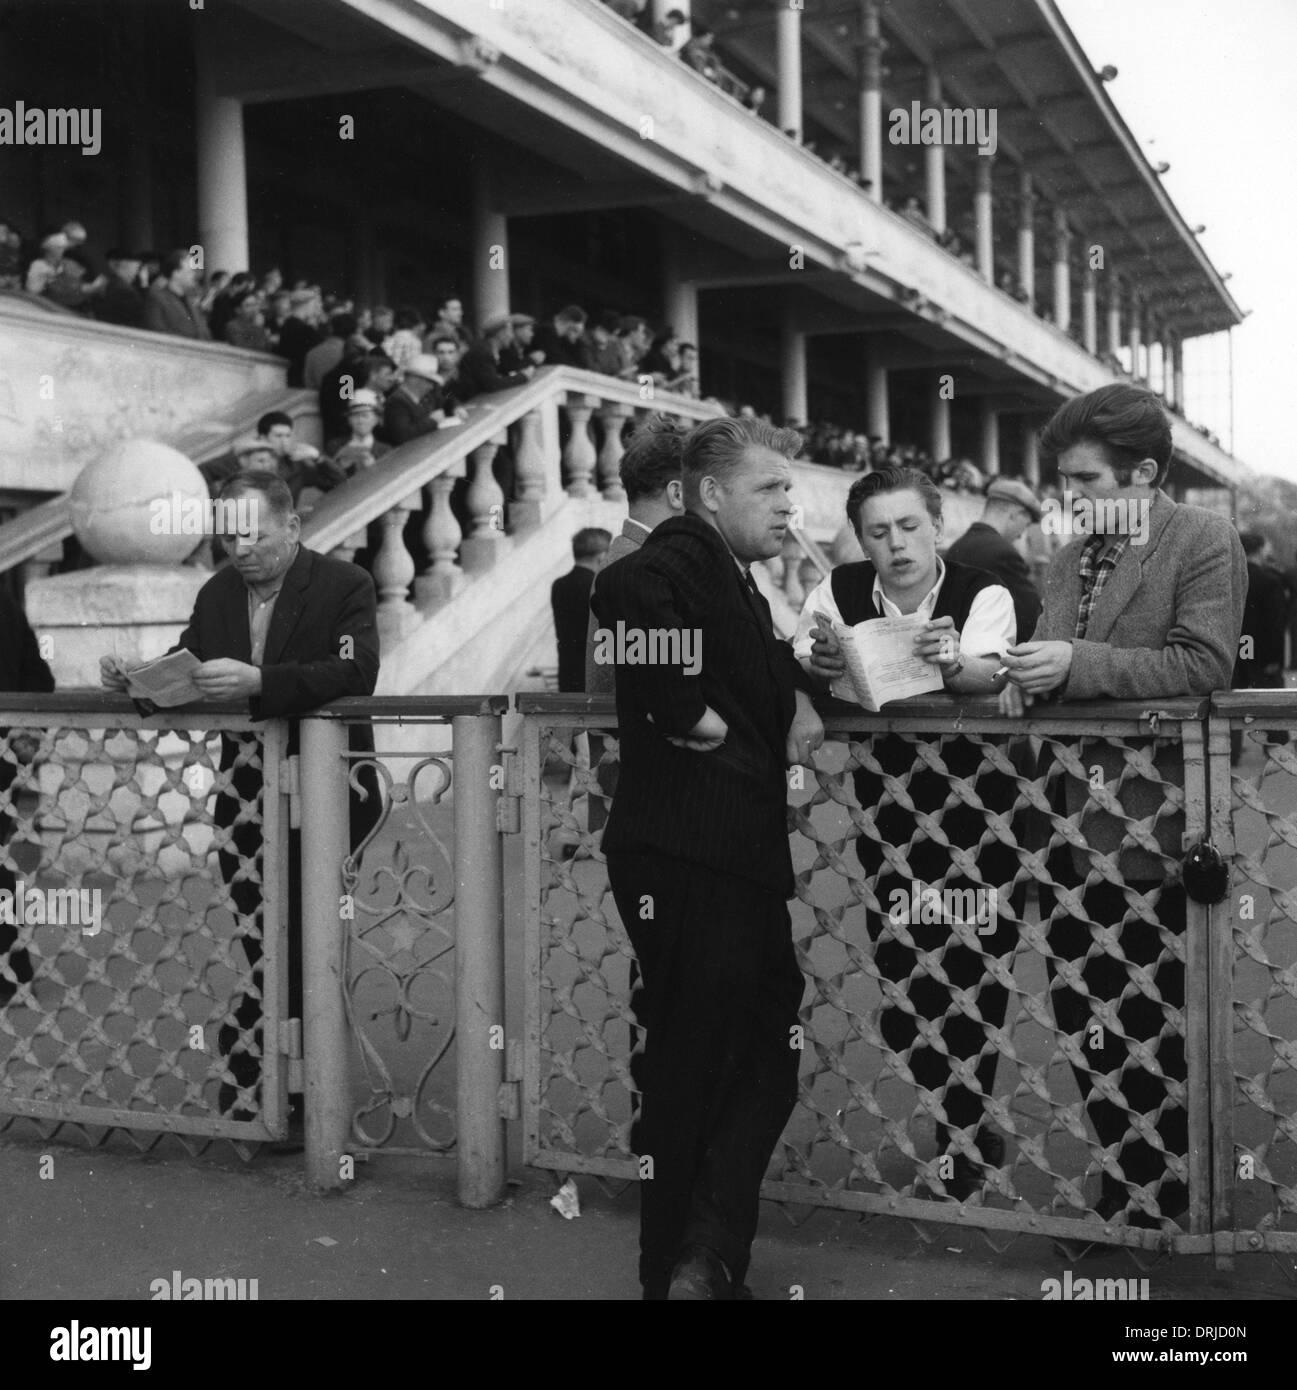 Personas en un hipódromo de Moscú, Rusia Imagen De Stock